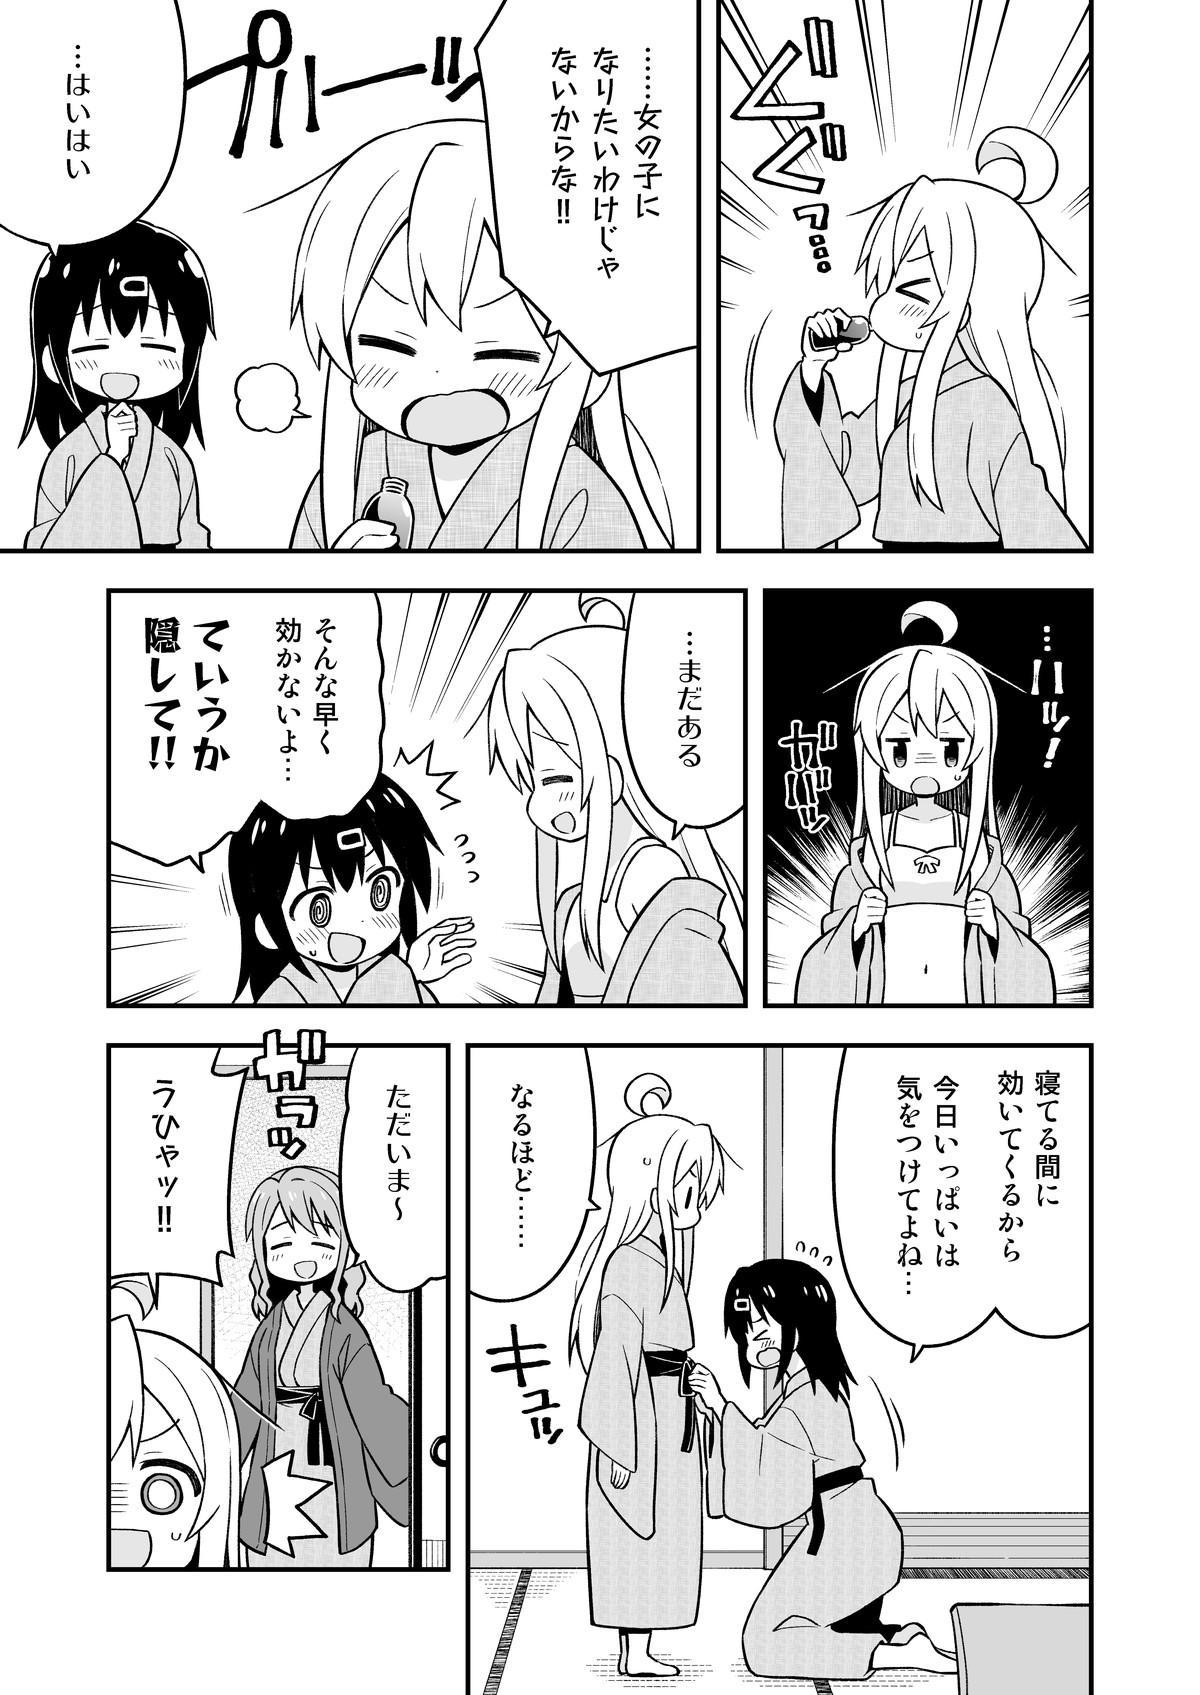 Onii-chan wa Oshimai! 6 35